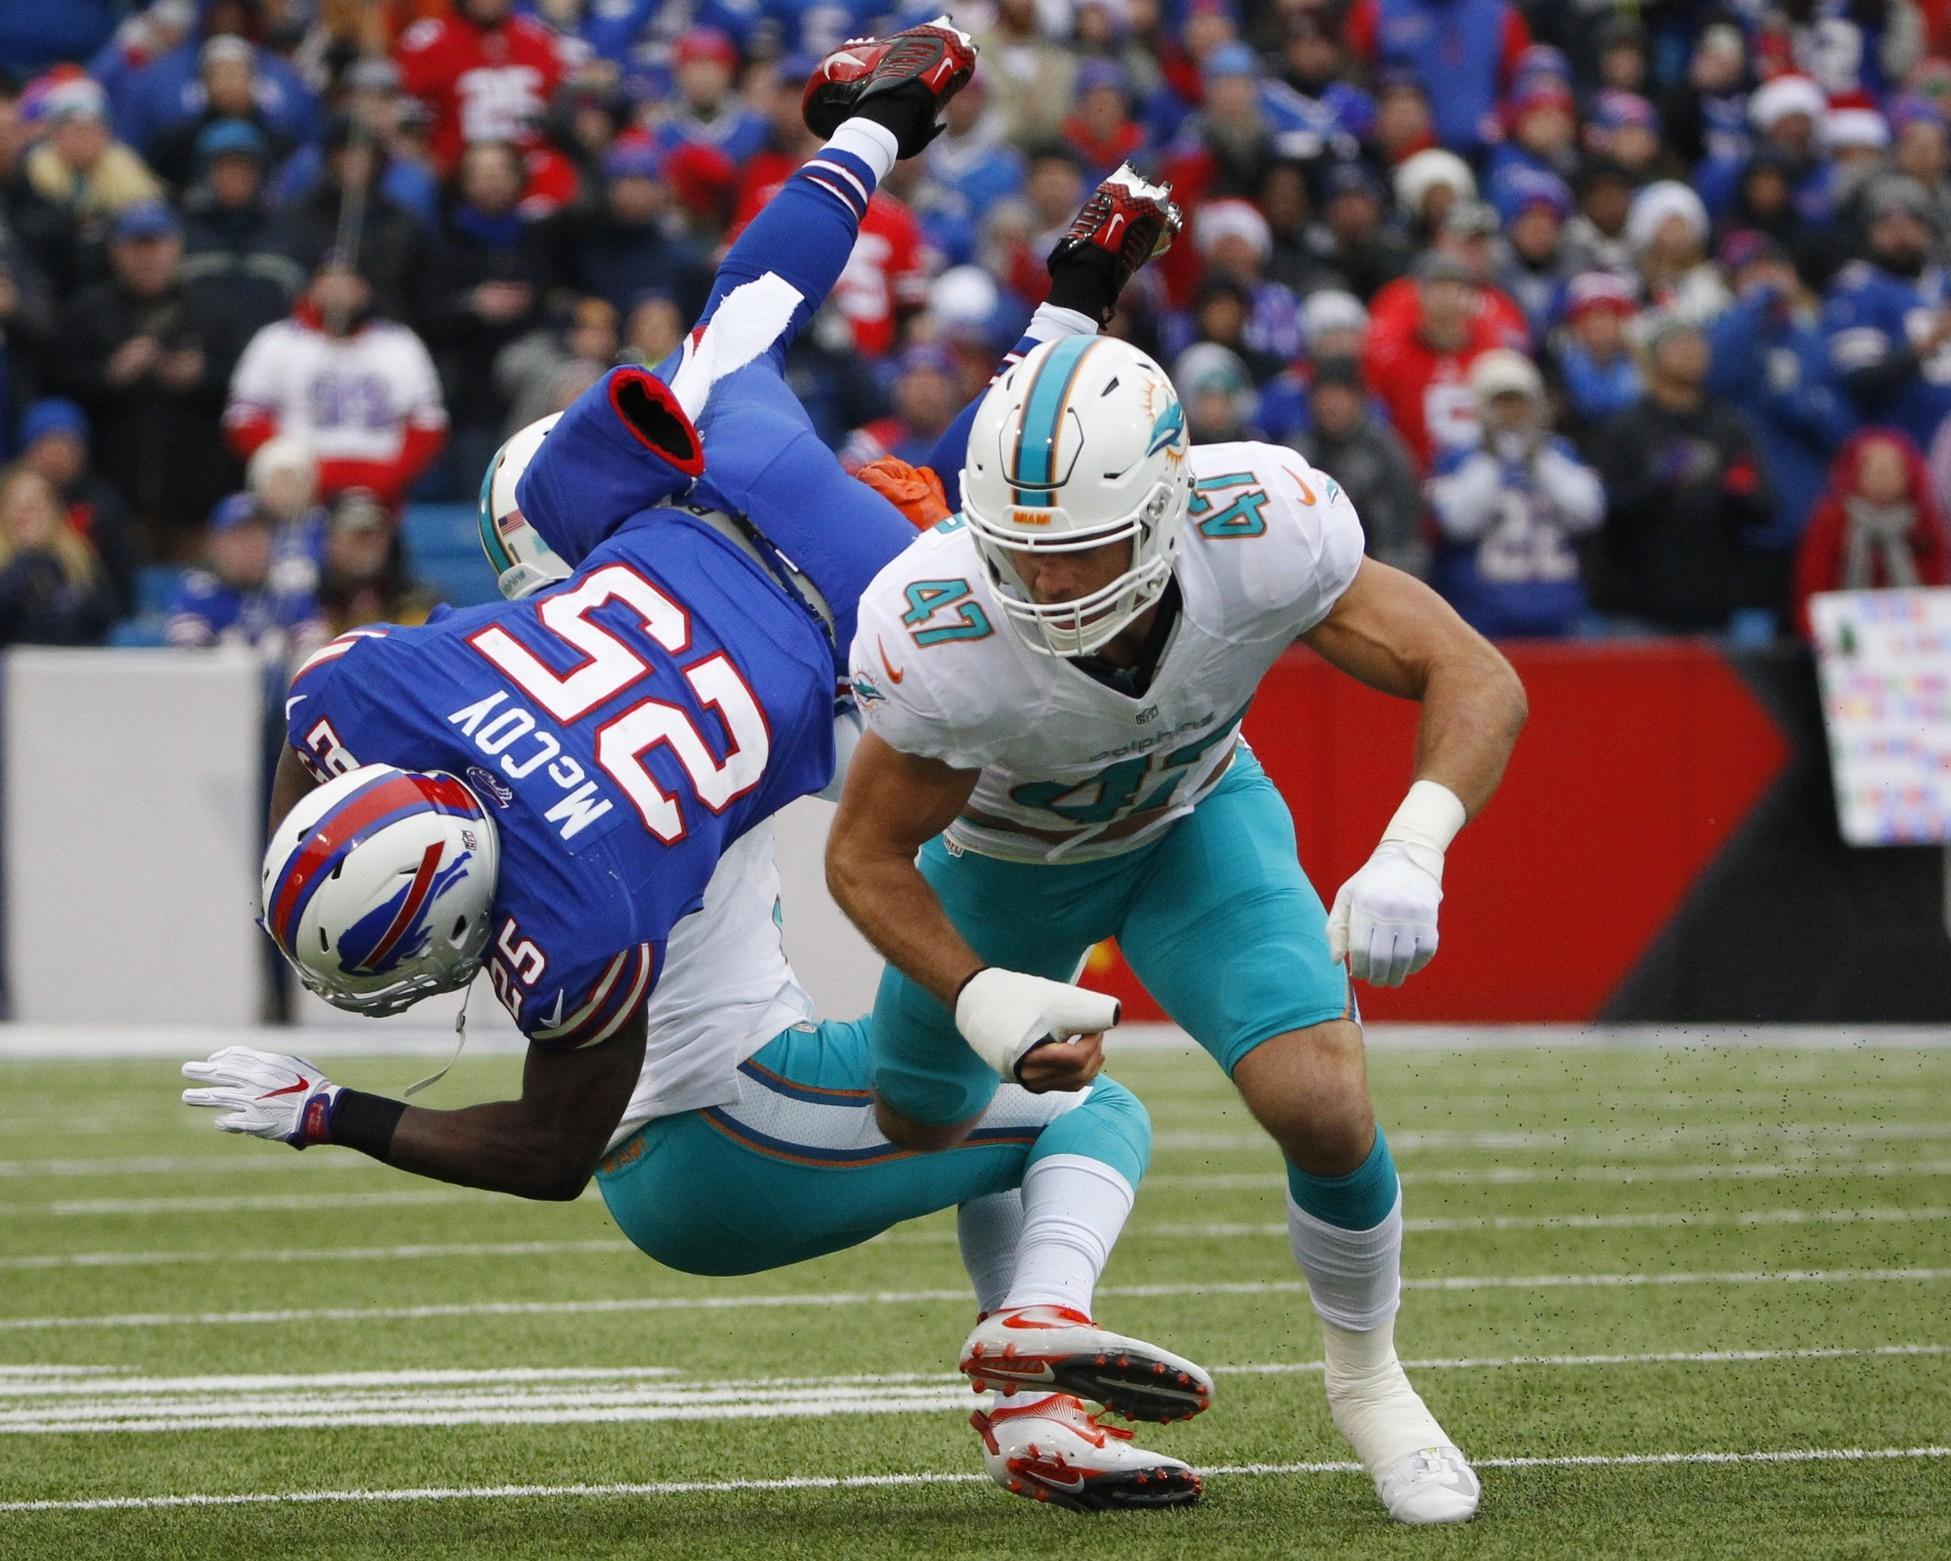 Daniel Thomas looks for running room against the Bills. Miami Dolphins vs. Buffalo Bills. Ralph Wilson Stadium, Orchard Park, NY. 12/23/12. Jim Rassol, Sun Sentinel.